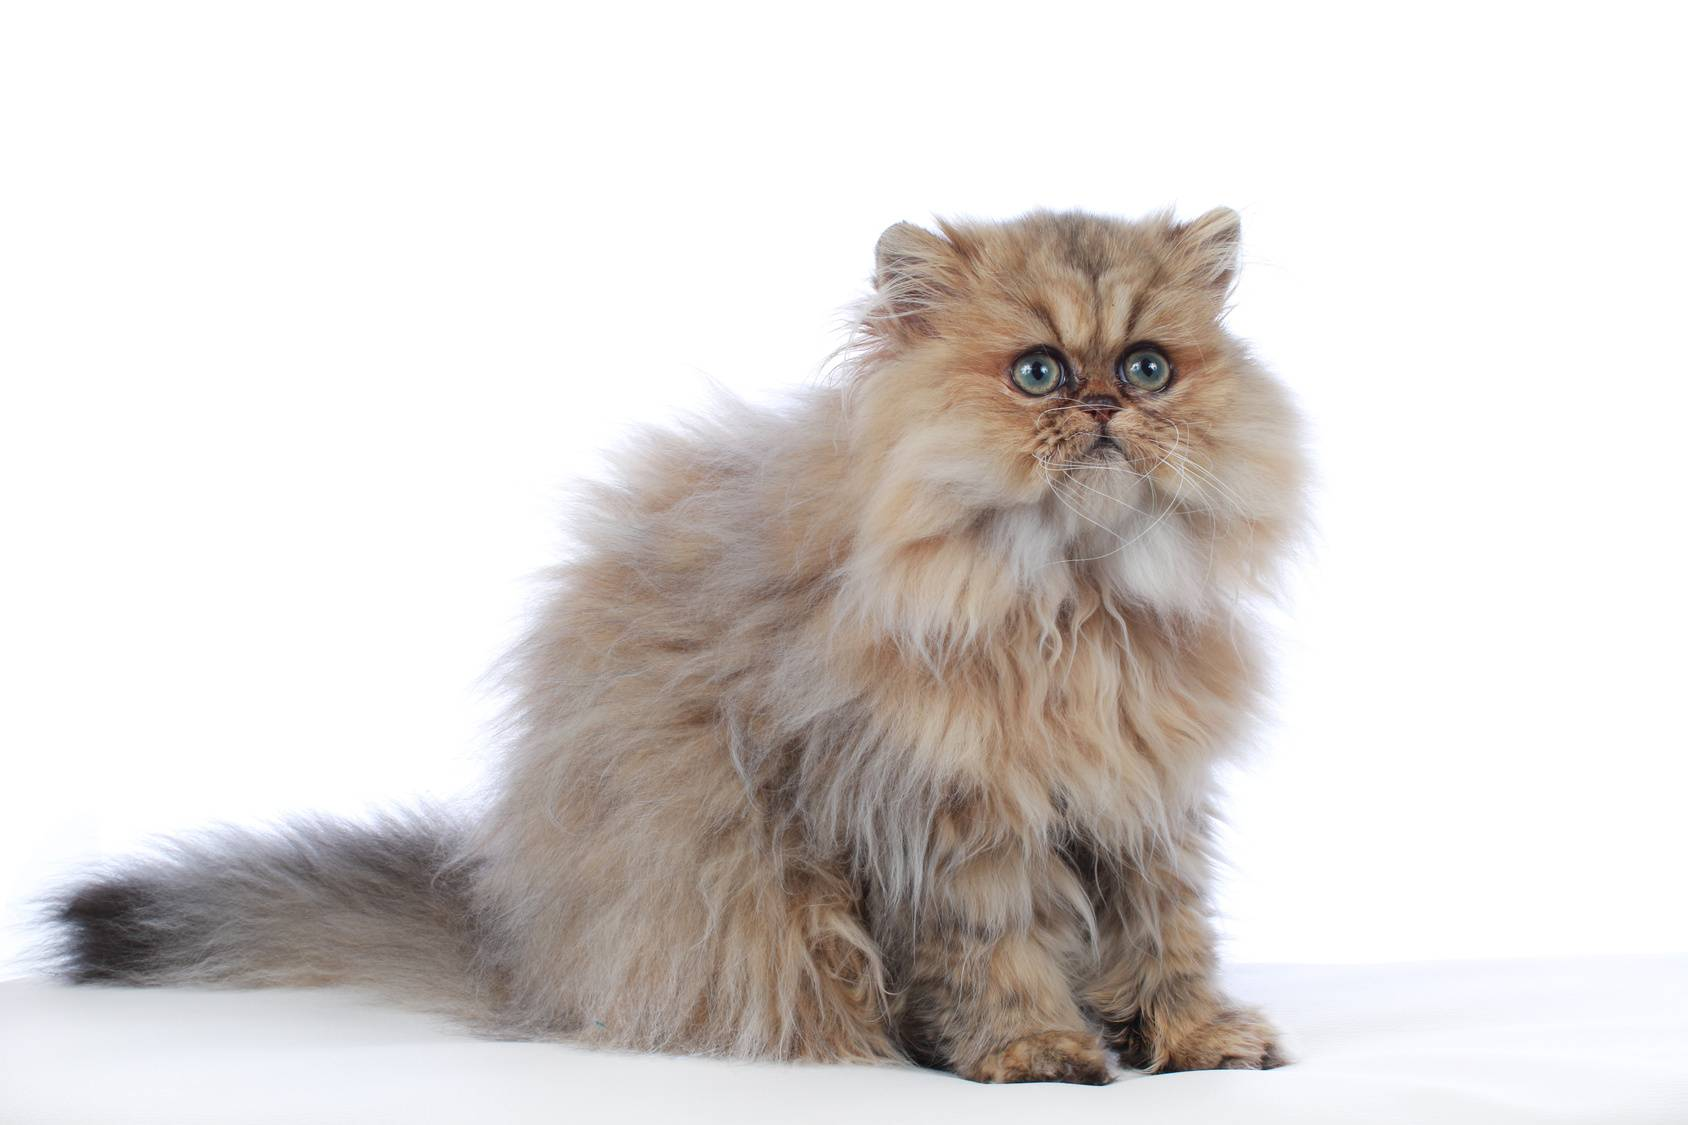 Персидская кошка: особенности характера, стандарт и правила ухода